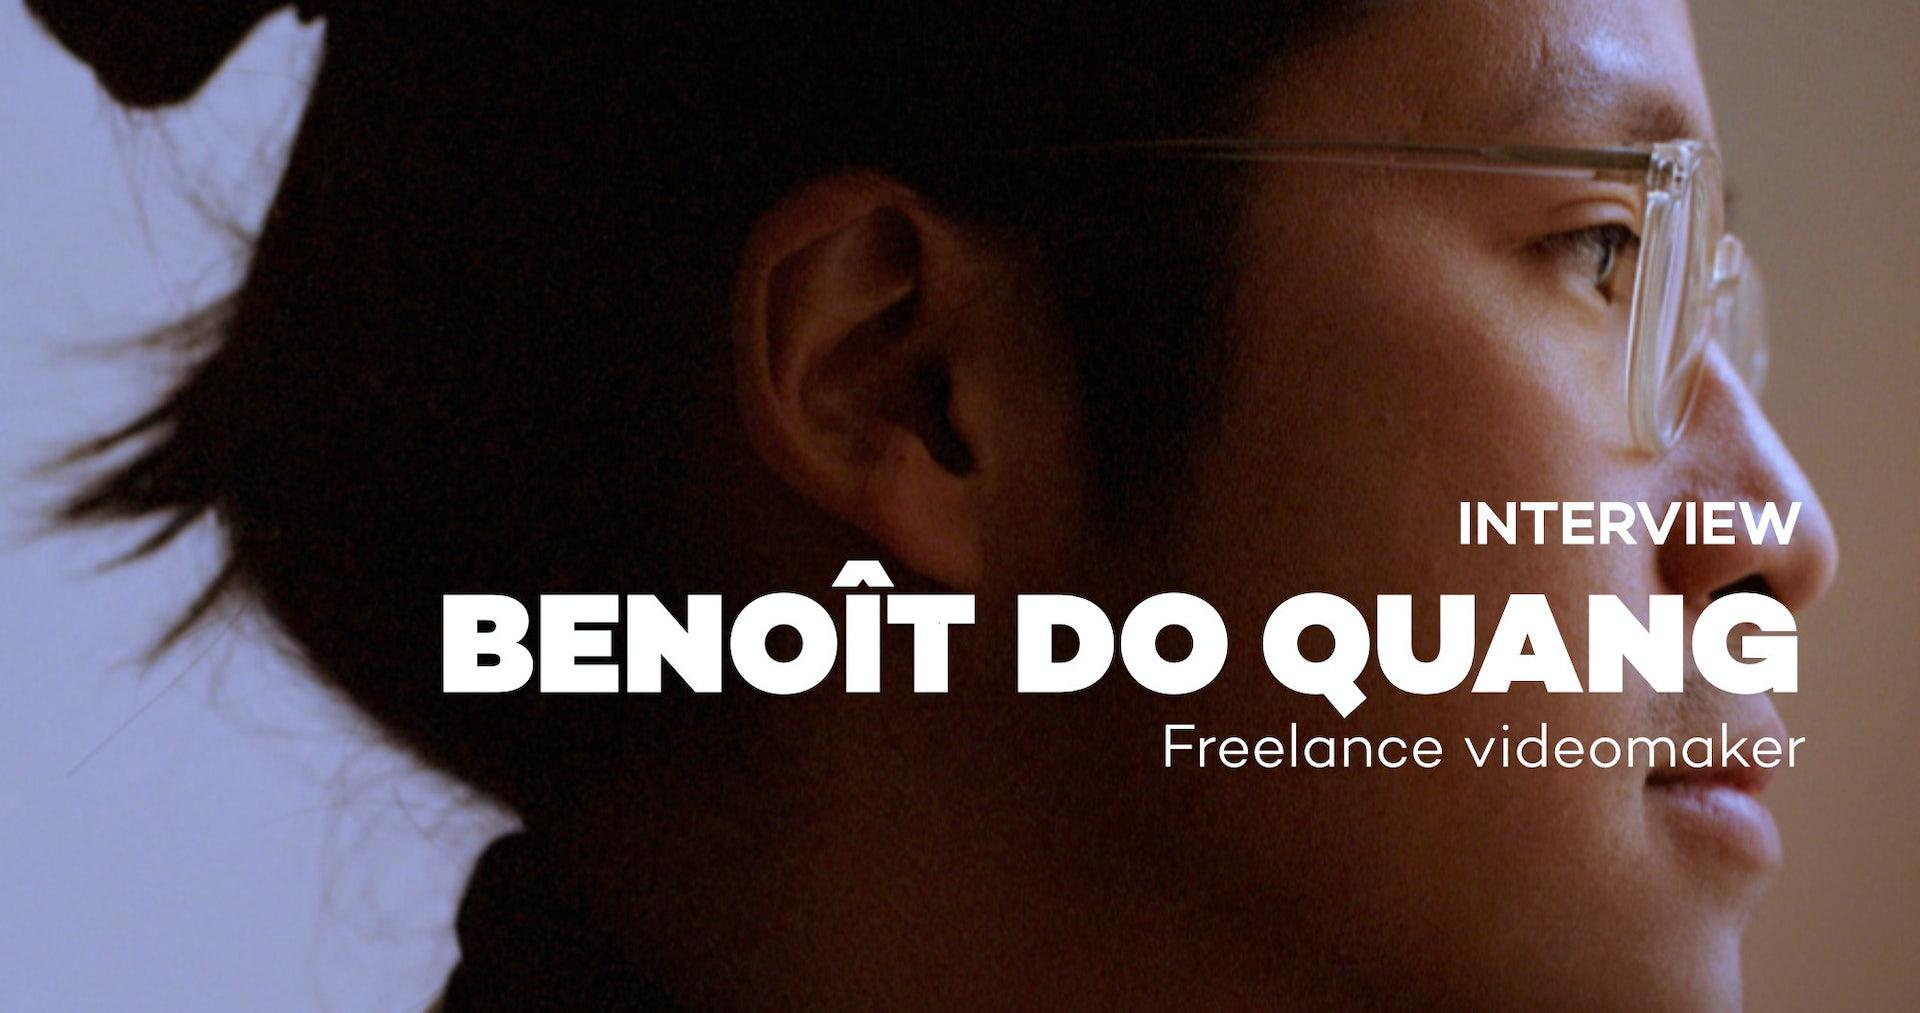 Benoît Do Quang